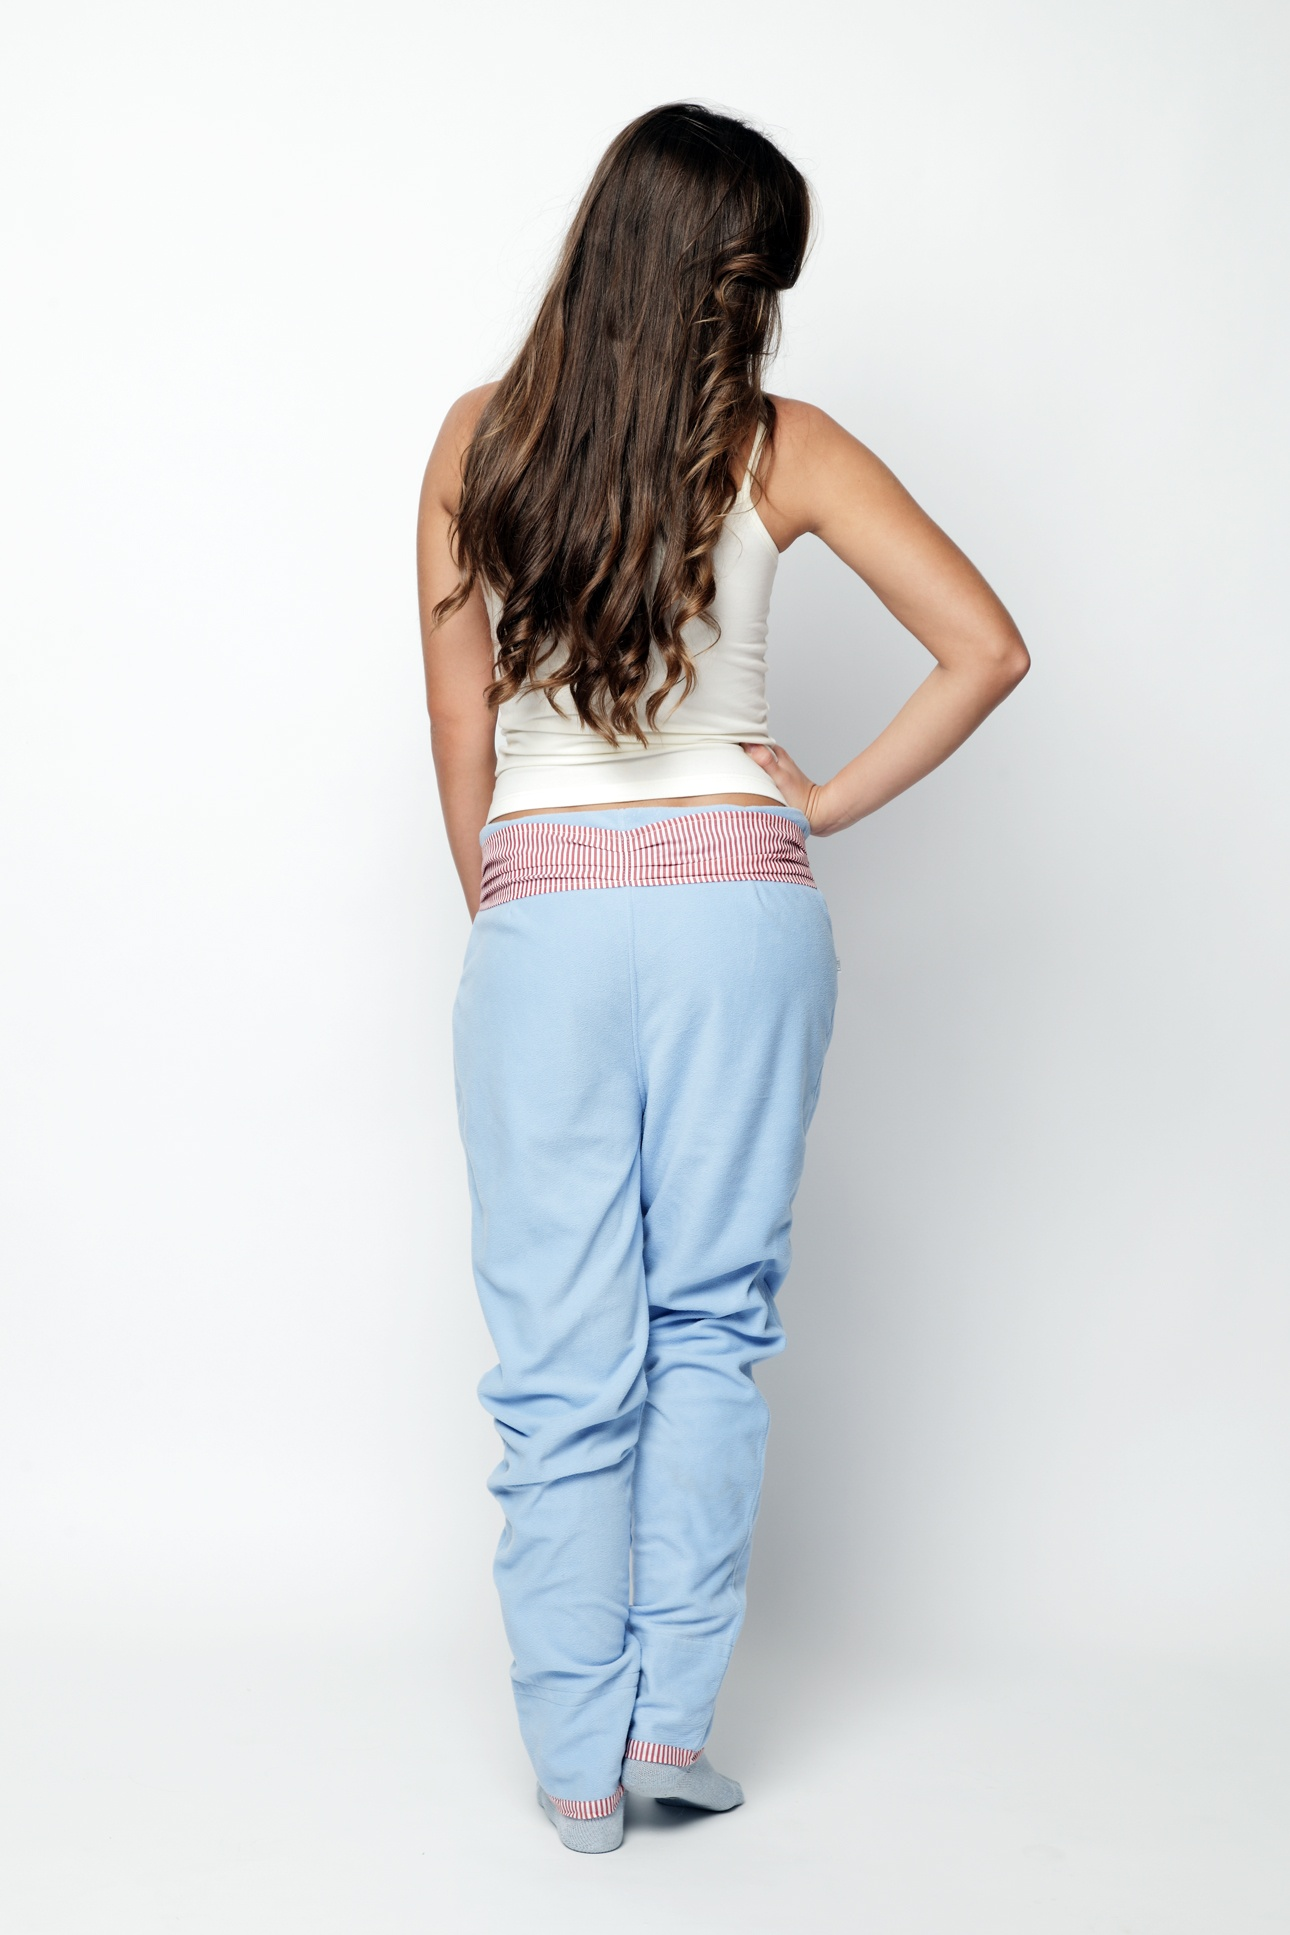 Tepláky Parisian Blue - Lull Homewear Barva: modrá, Velikost: S